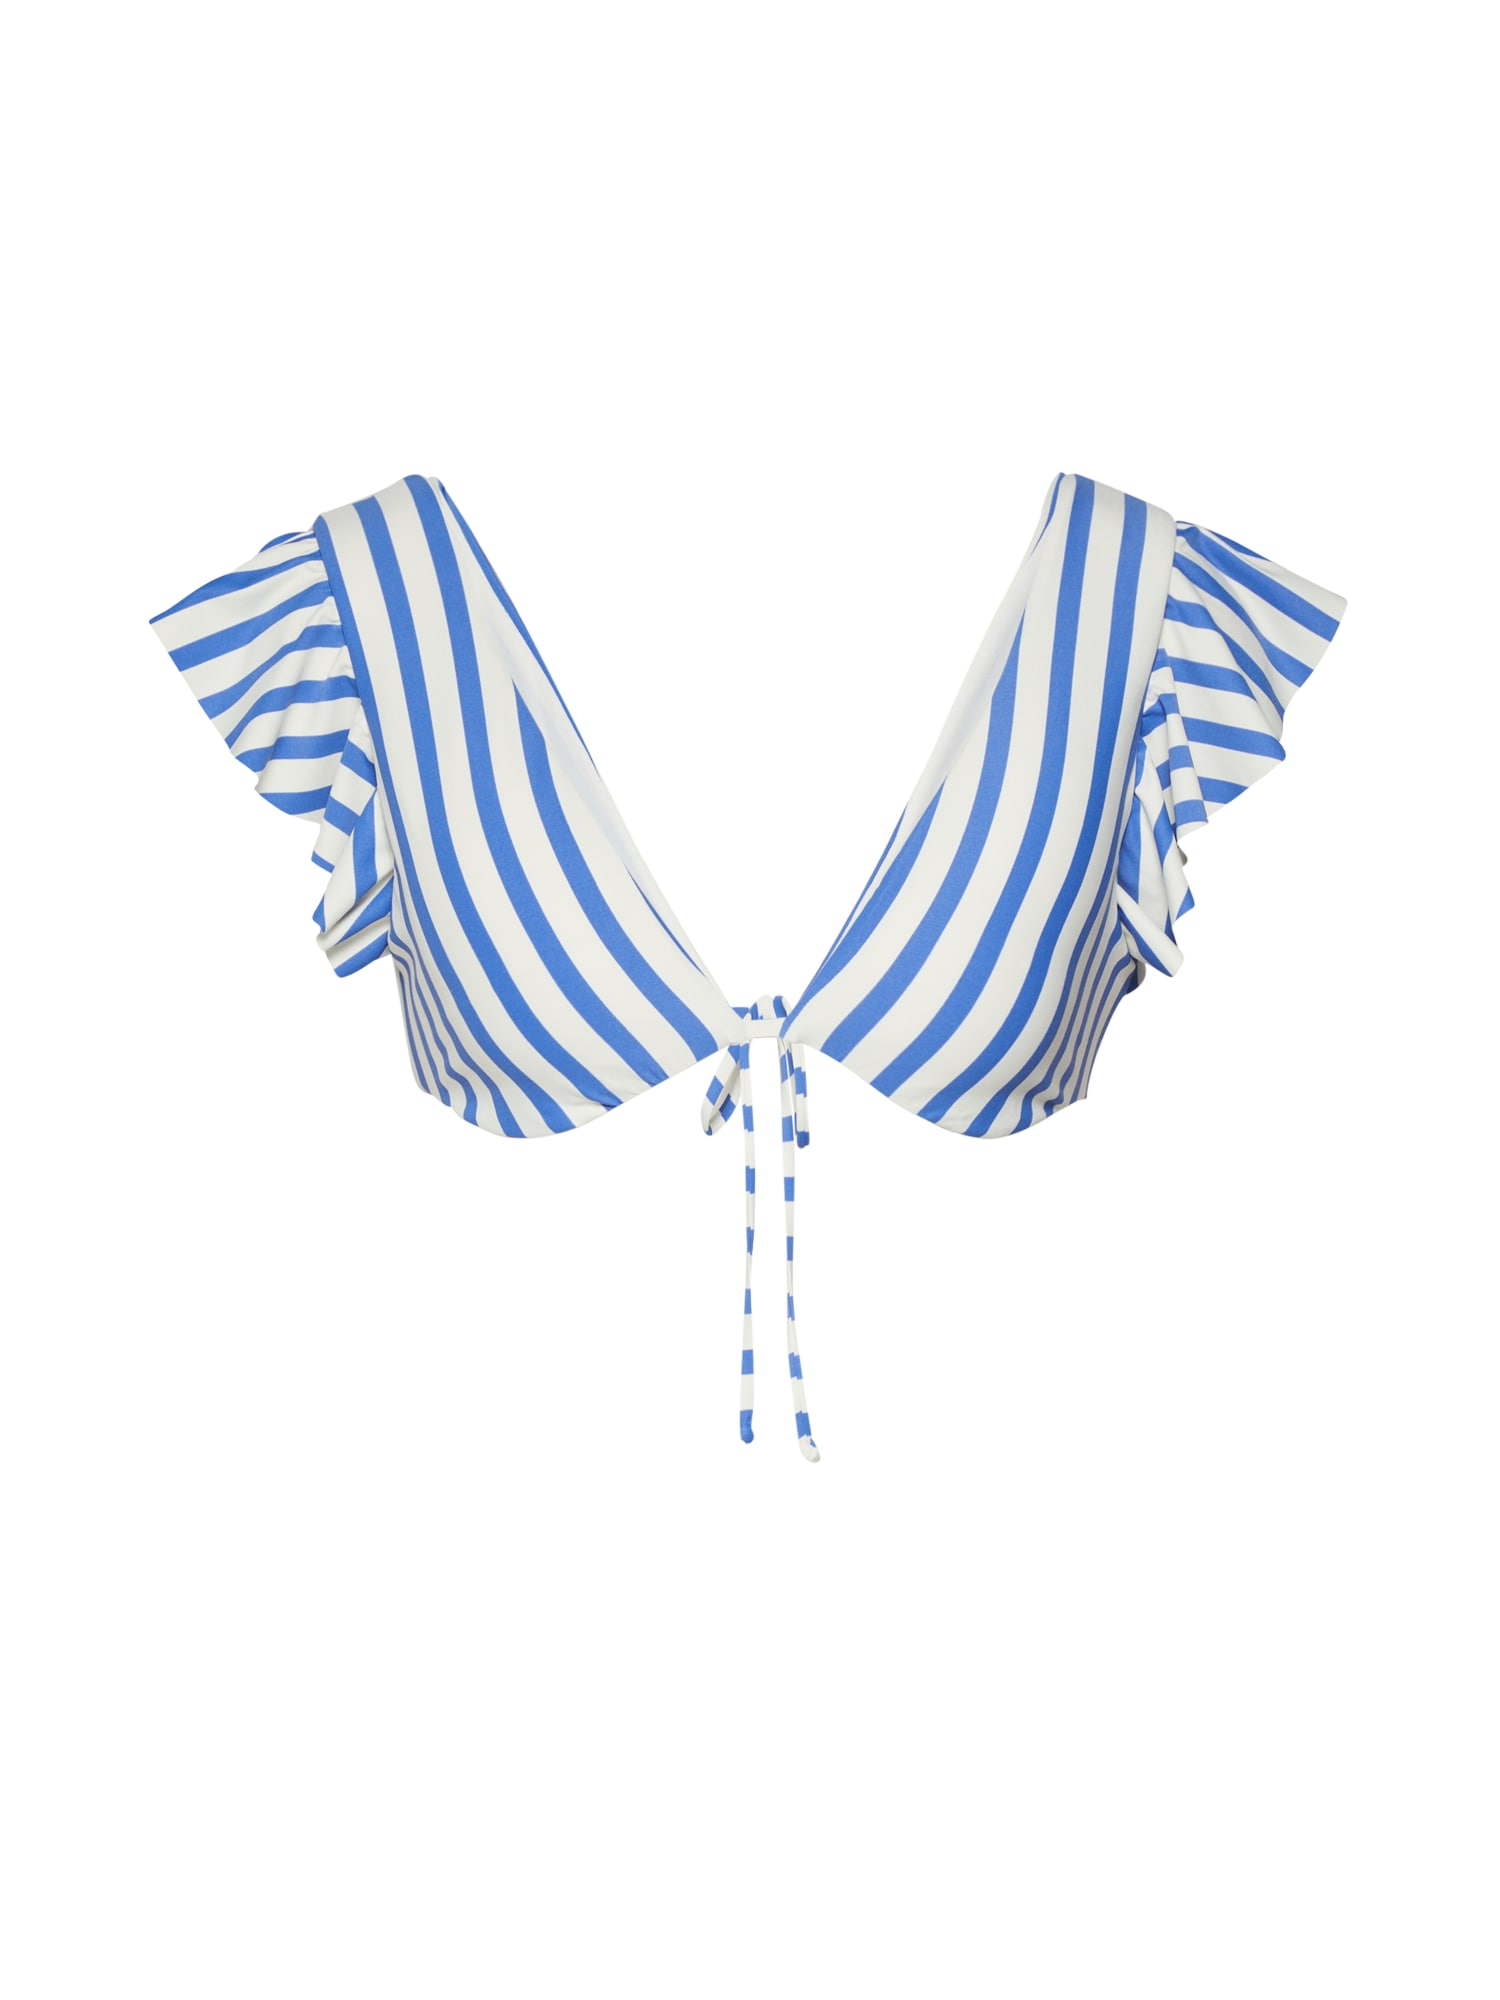 BILLABONG Bikinio viršutinė dalis 'blue by u plunge' balta / mėlyna